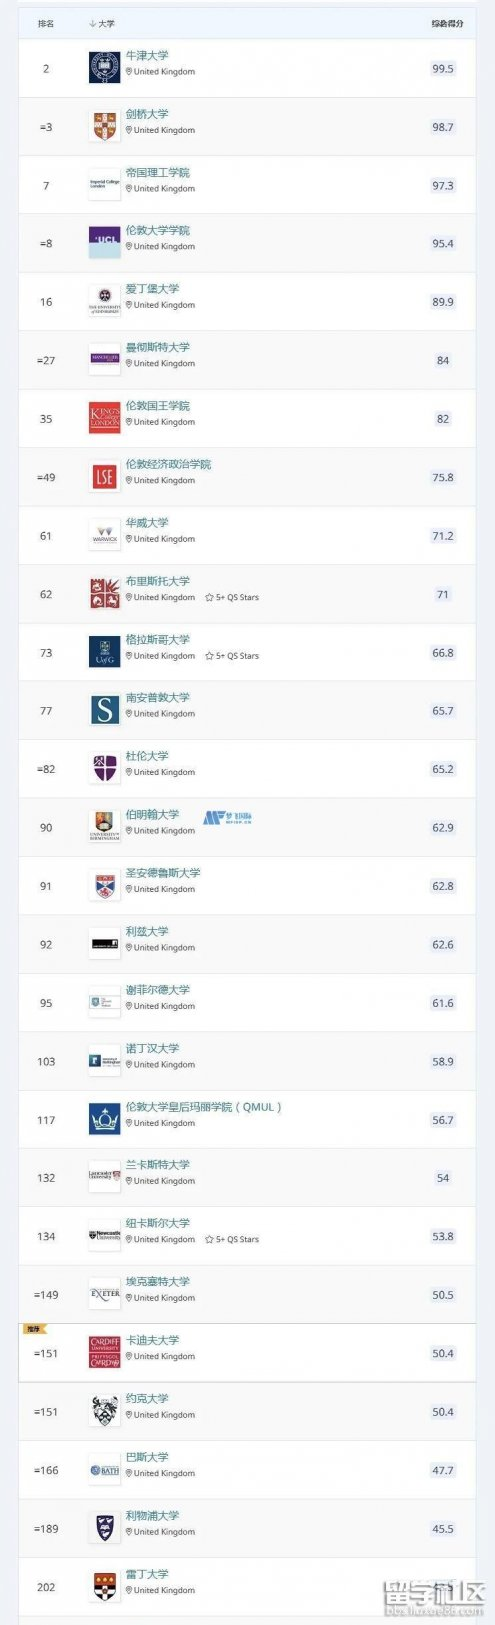 2022QS英国大学世界排名一览表